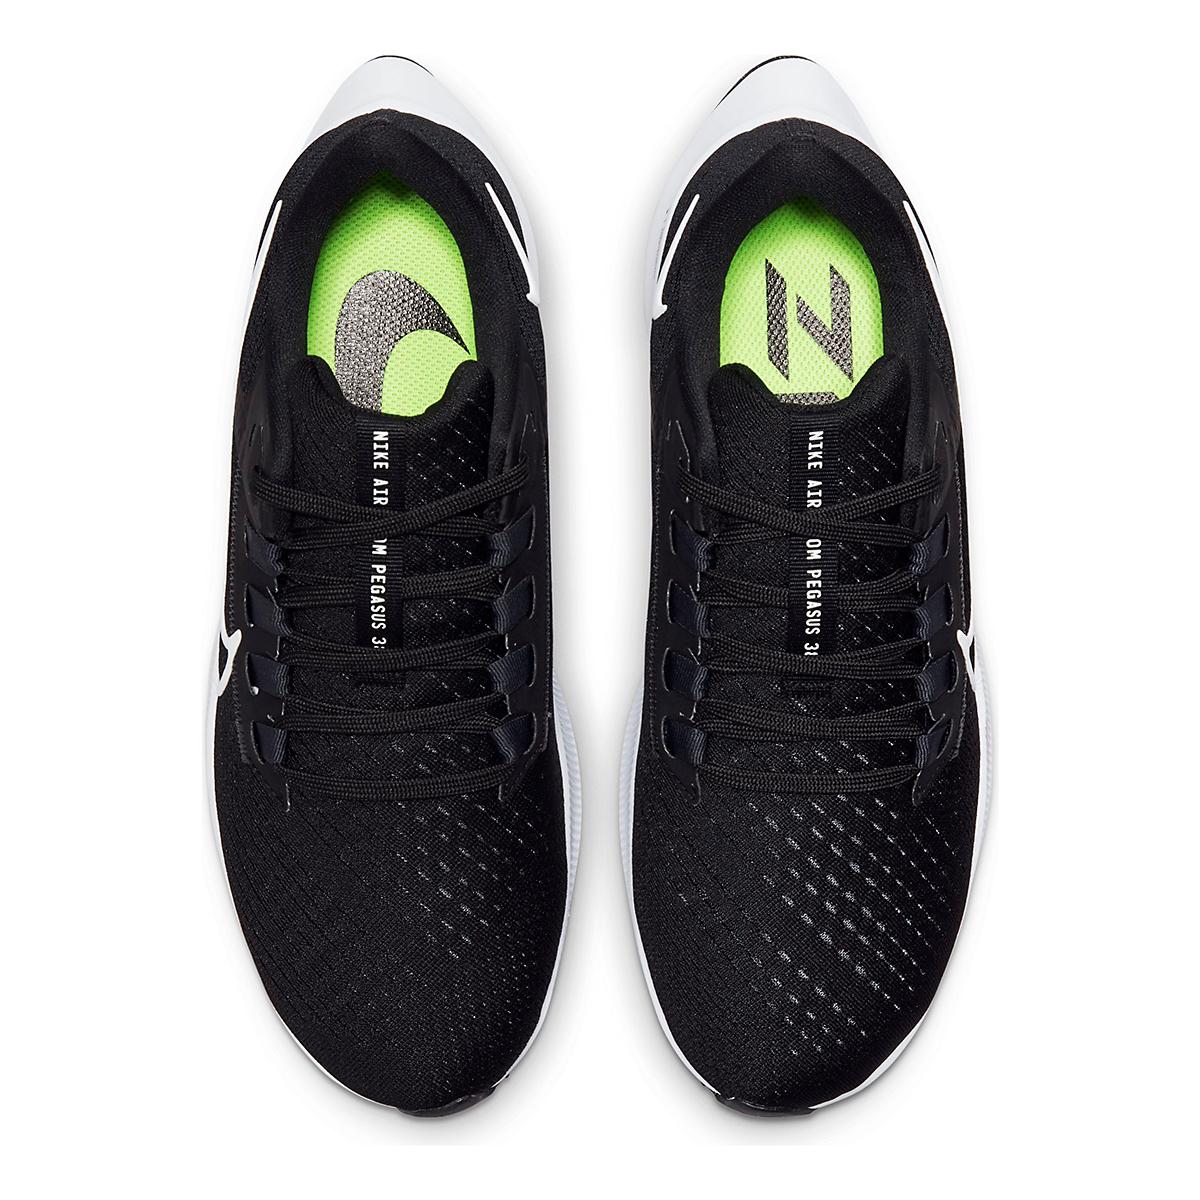 Women's Nike Air Zoom Pegasus 38 Running Shoe - Color: Black/White/Anthracite - Size: 5 - Width: Regular, Black/White/Anthracite, large, image 6